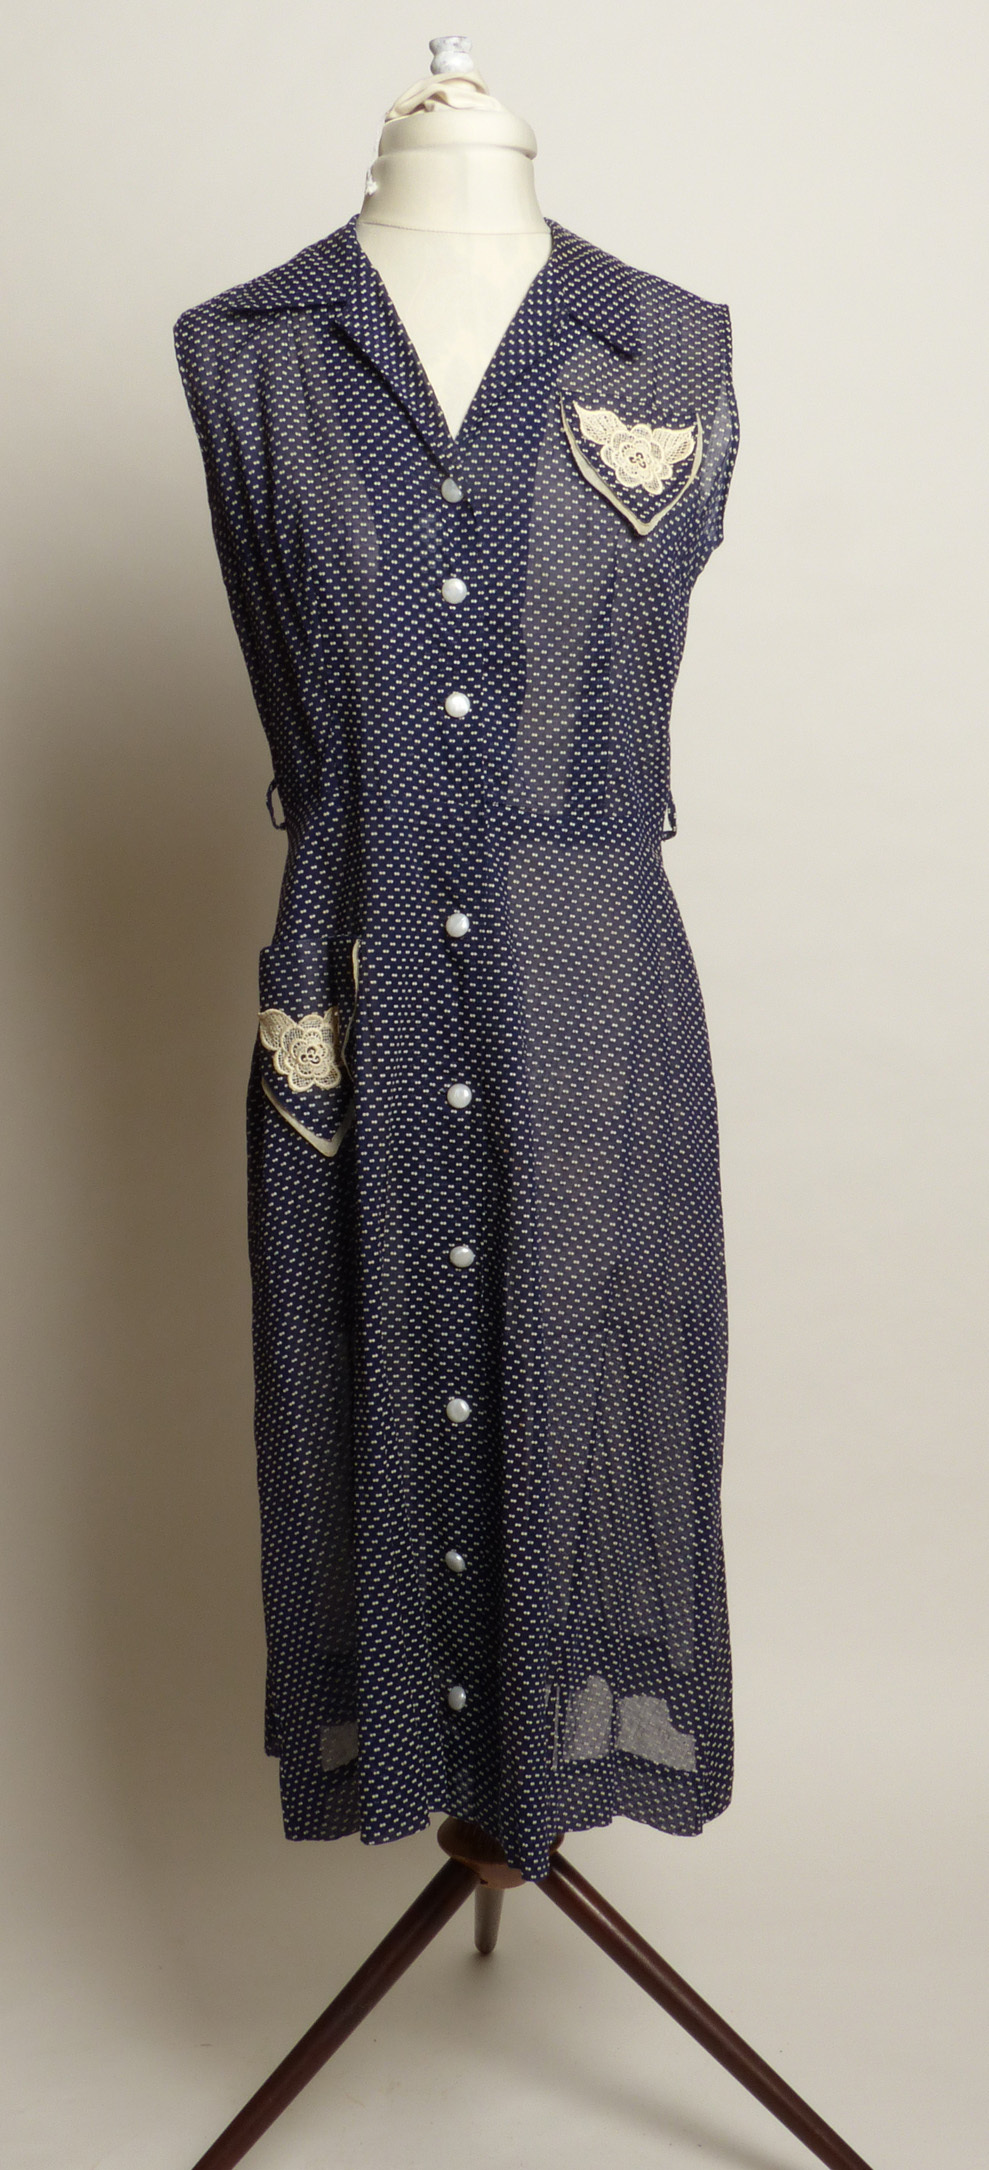 Circa 1950s Navy Blue & White Polka Dot Swiss Day Dress